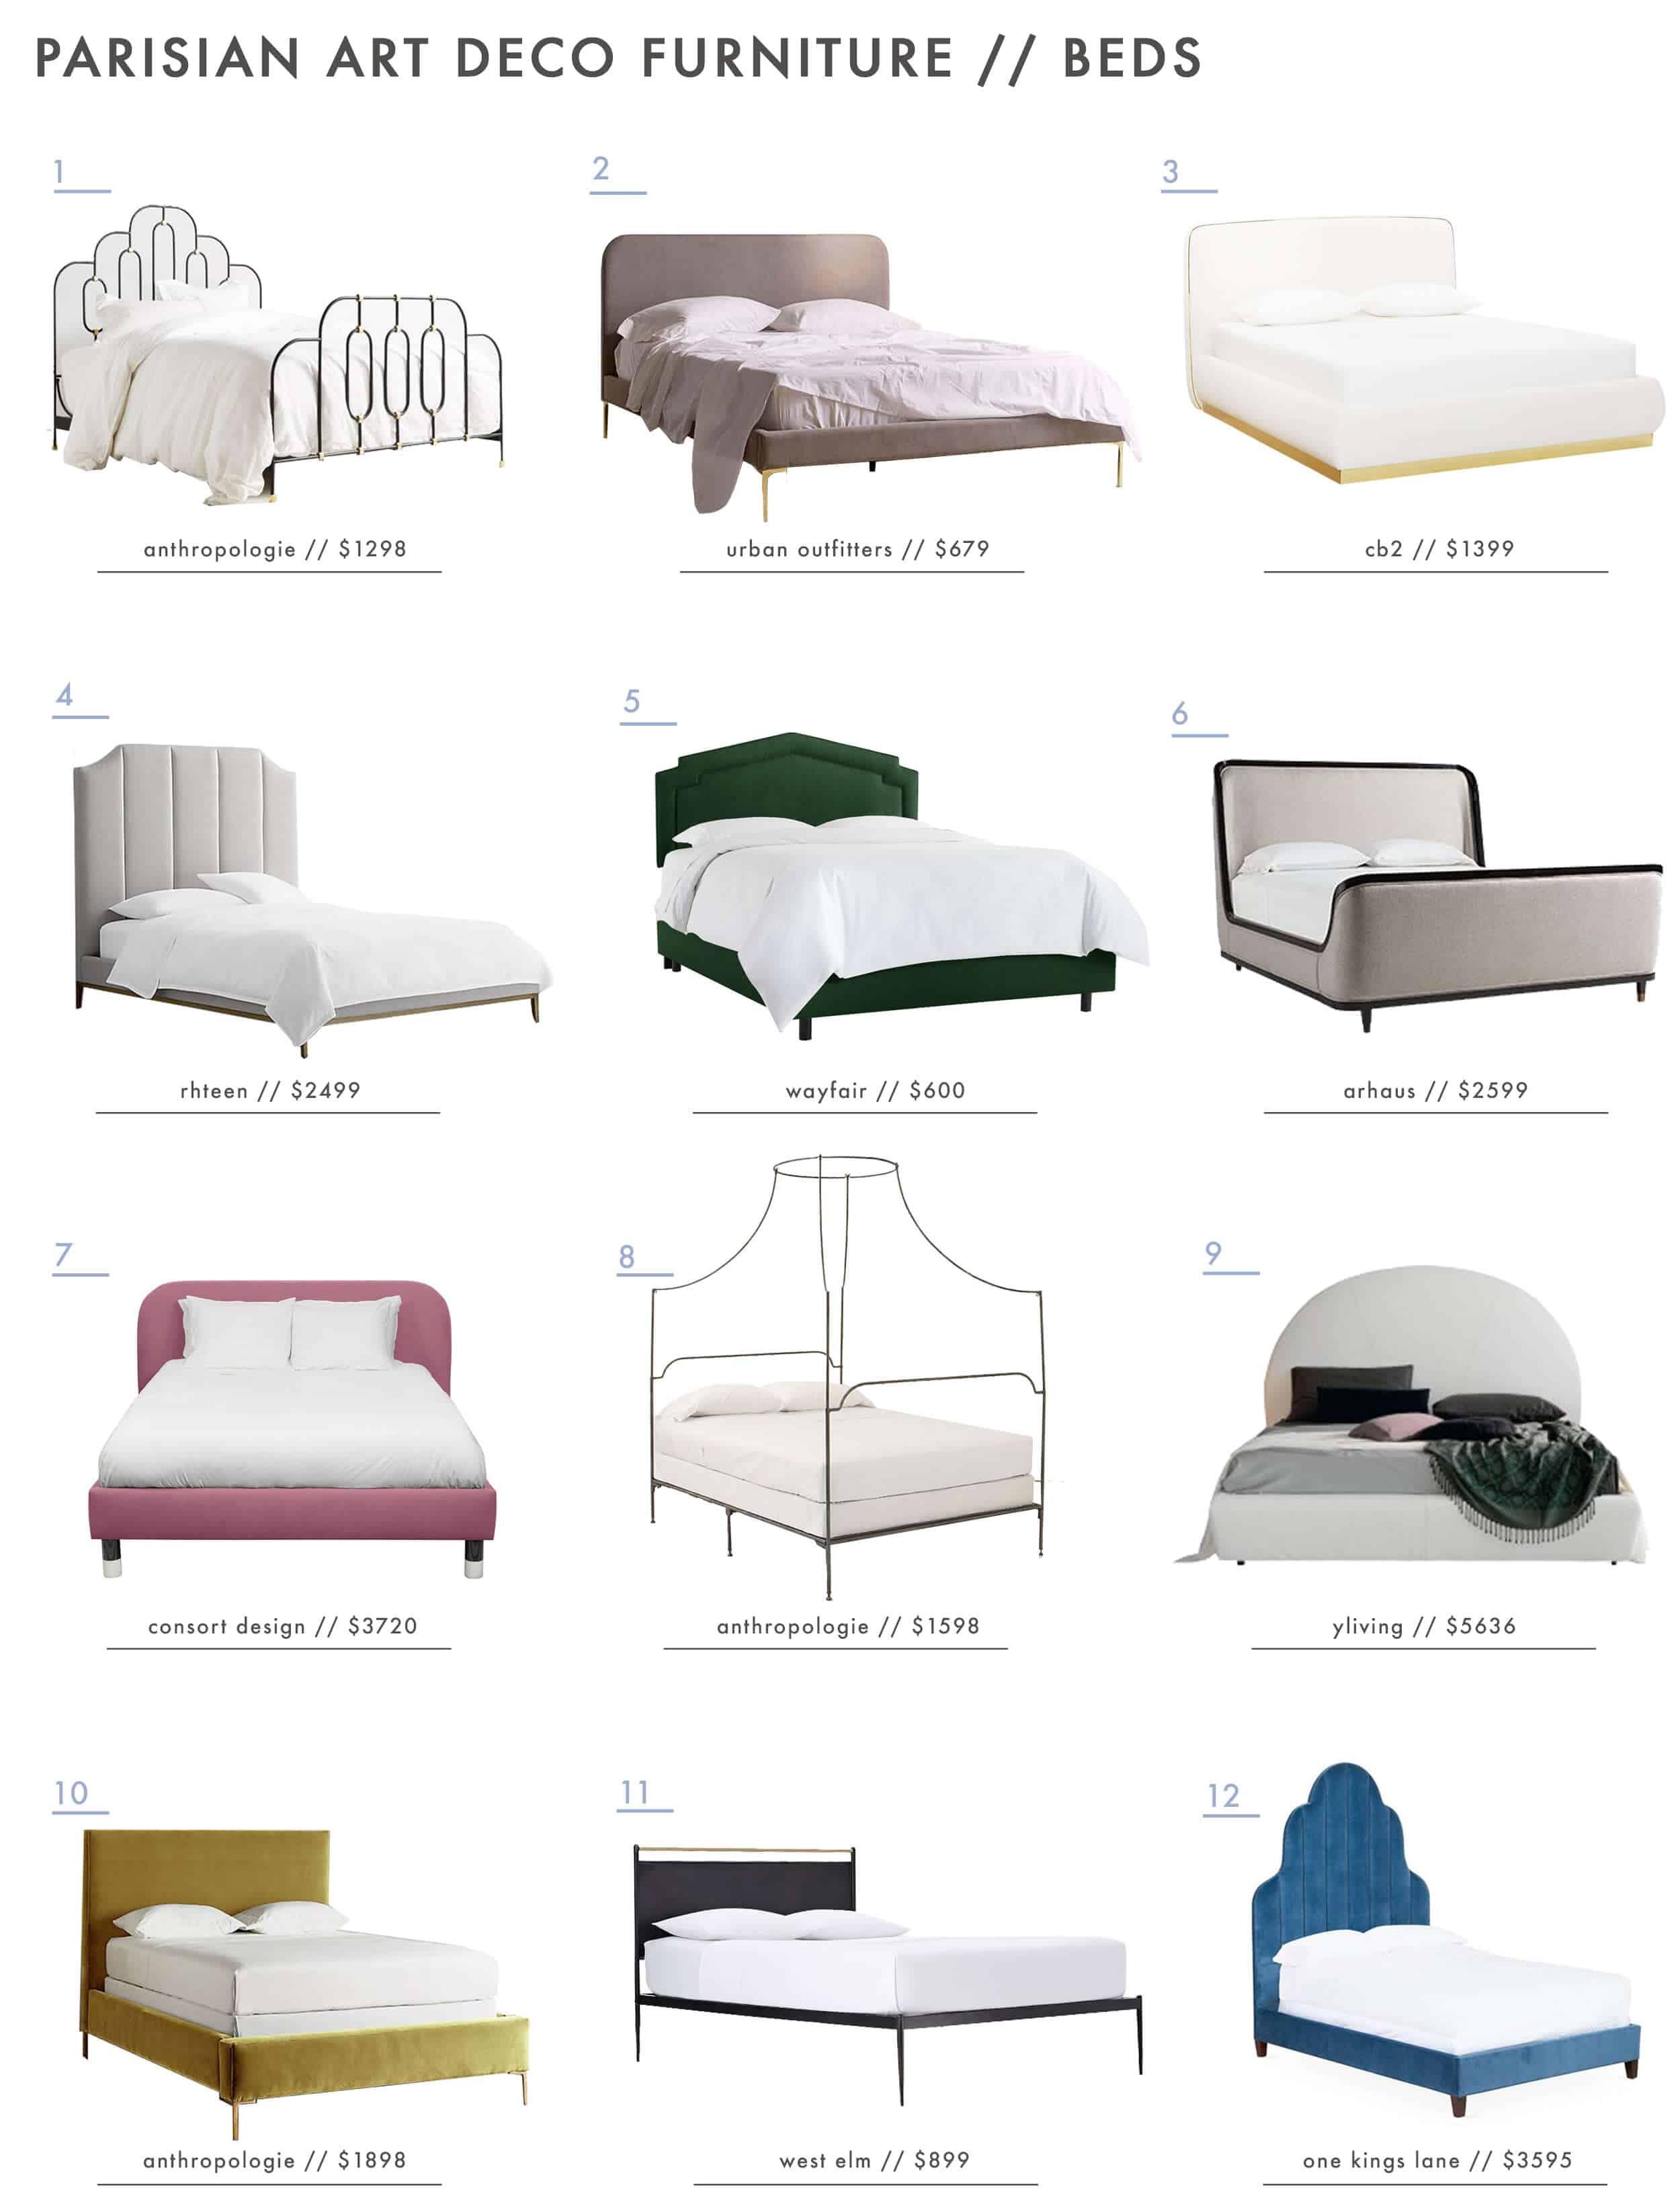 Emily Henderson Parisian Art Deco Furniture Beds Roundup